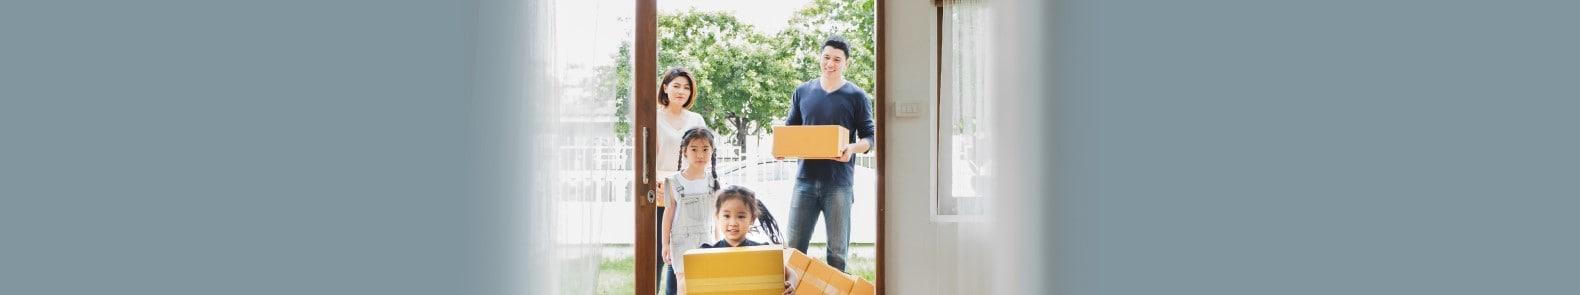 Home Loan 2021